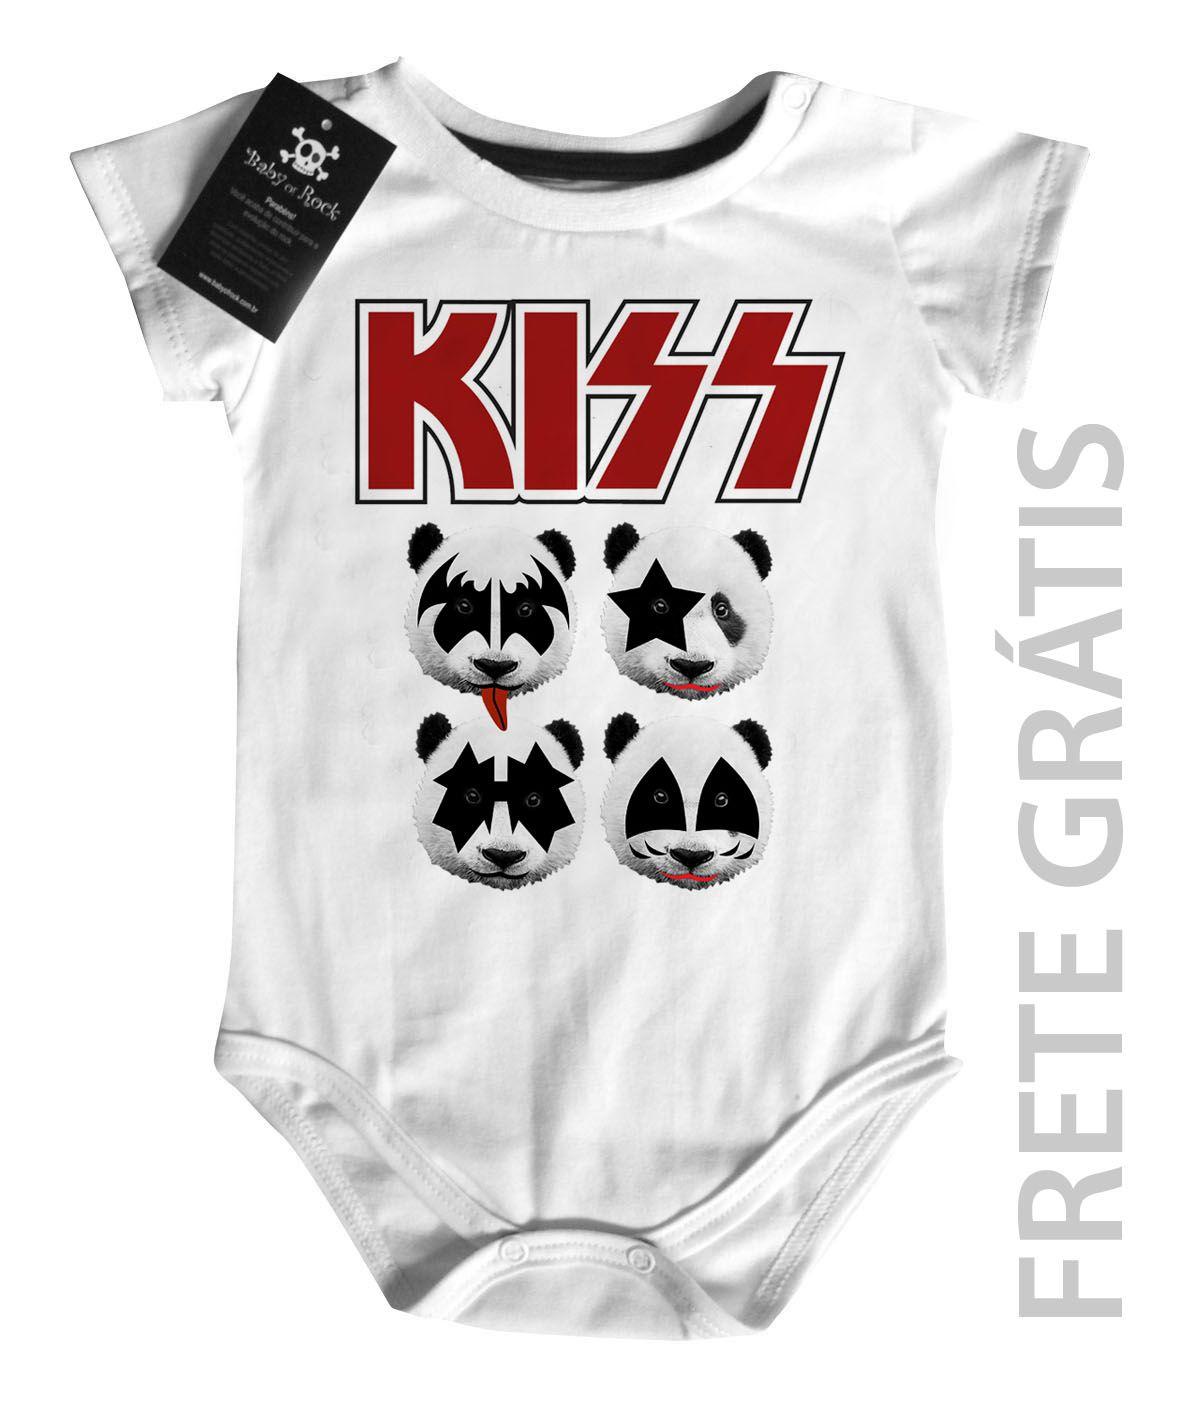 Body Baby Rock - Kiss - Panda - White  - Baby Monster S/A